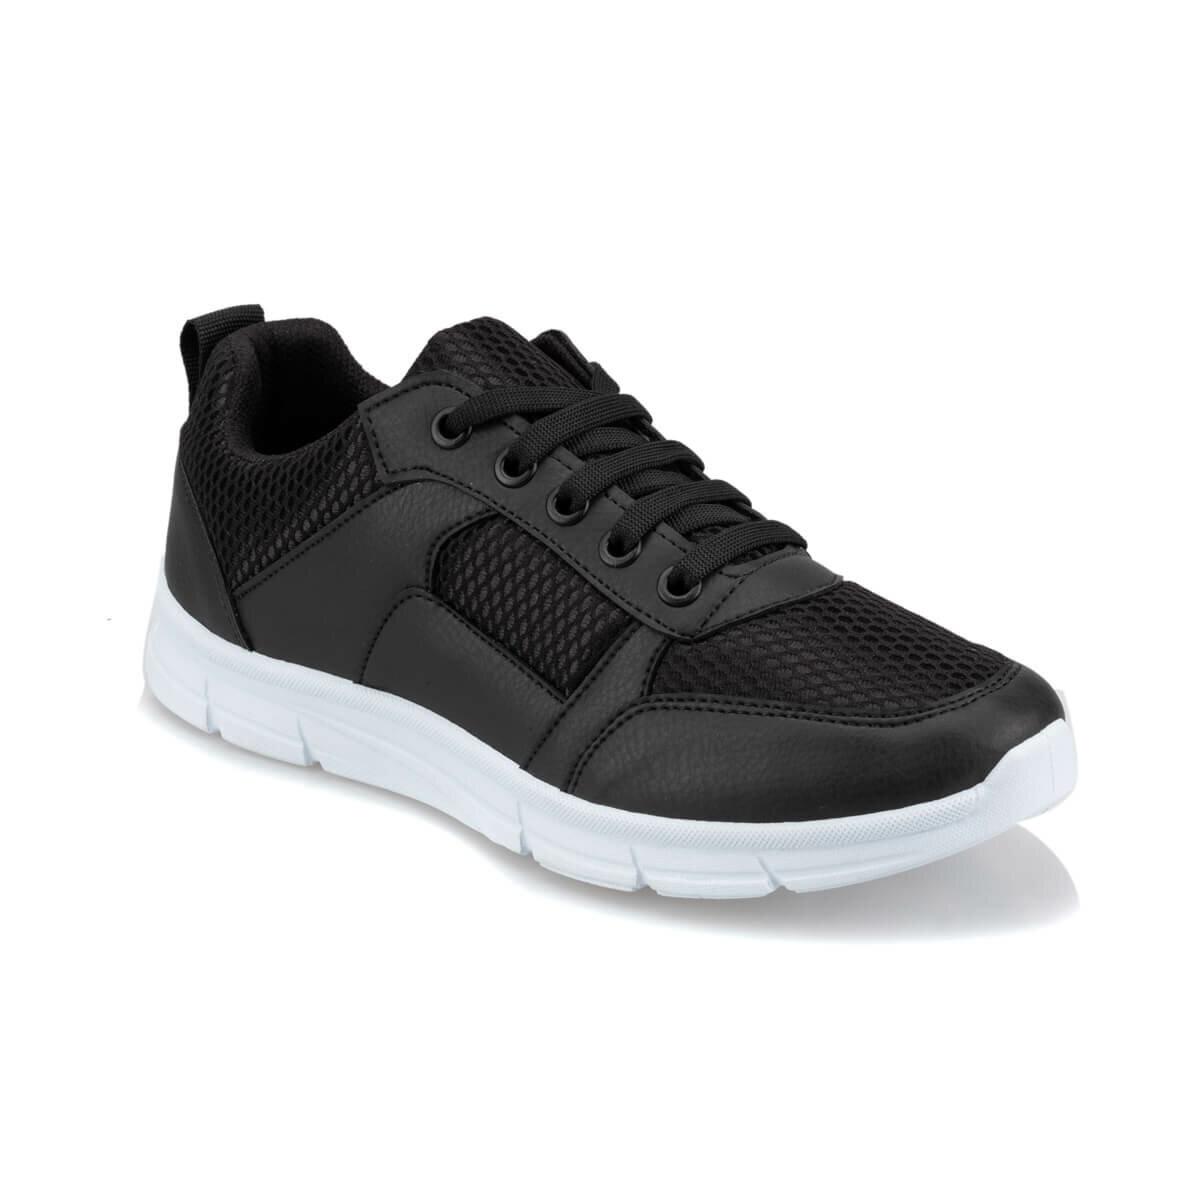 FLO 92.314824.Z Black Women Sneaker Polaris